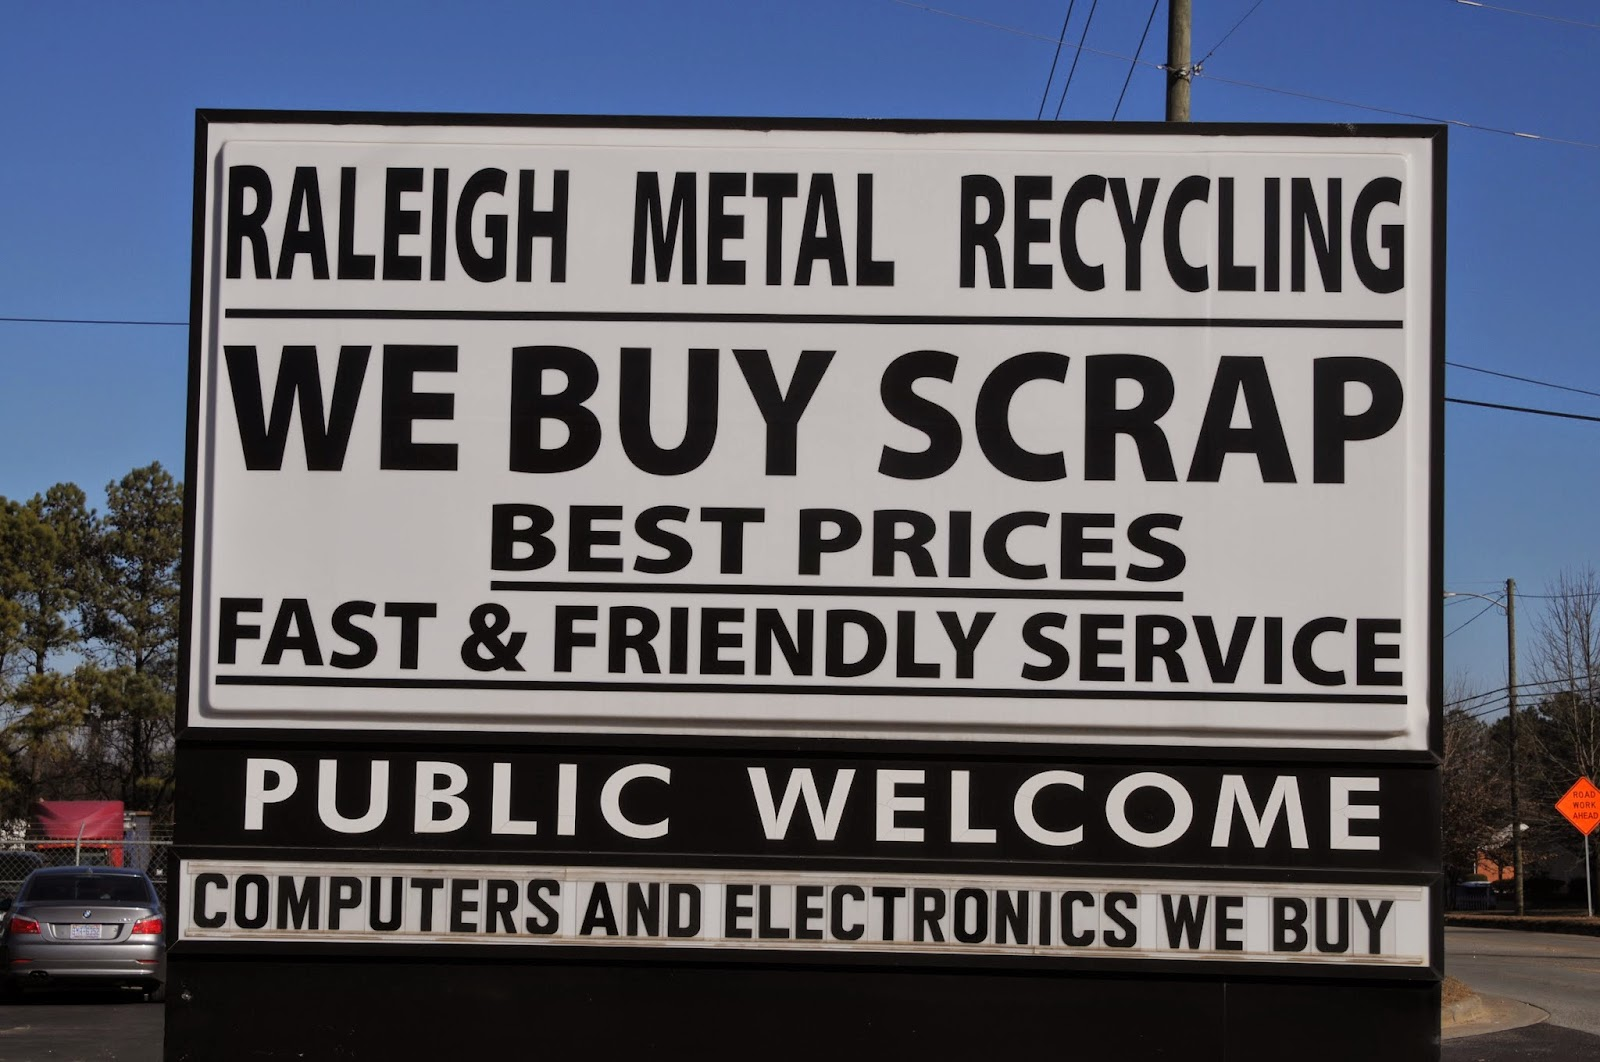 NC Scrap Metal Recycling, 2310 Garner Road, Raleigh, 919-828-5426